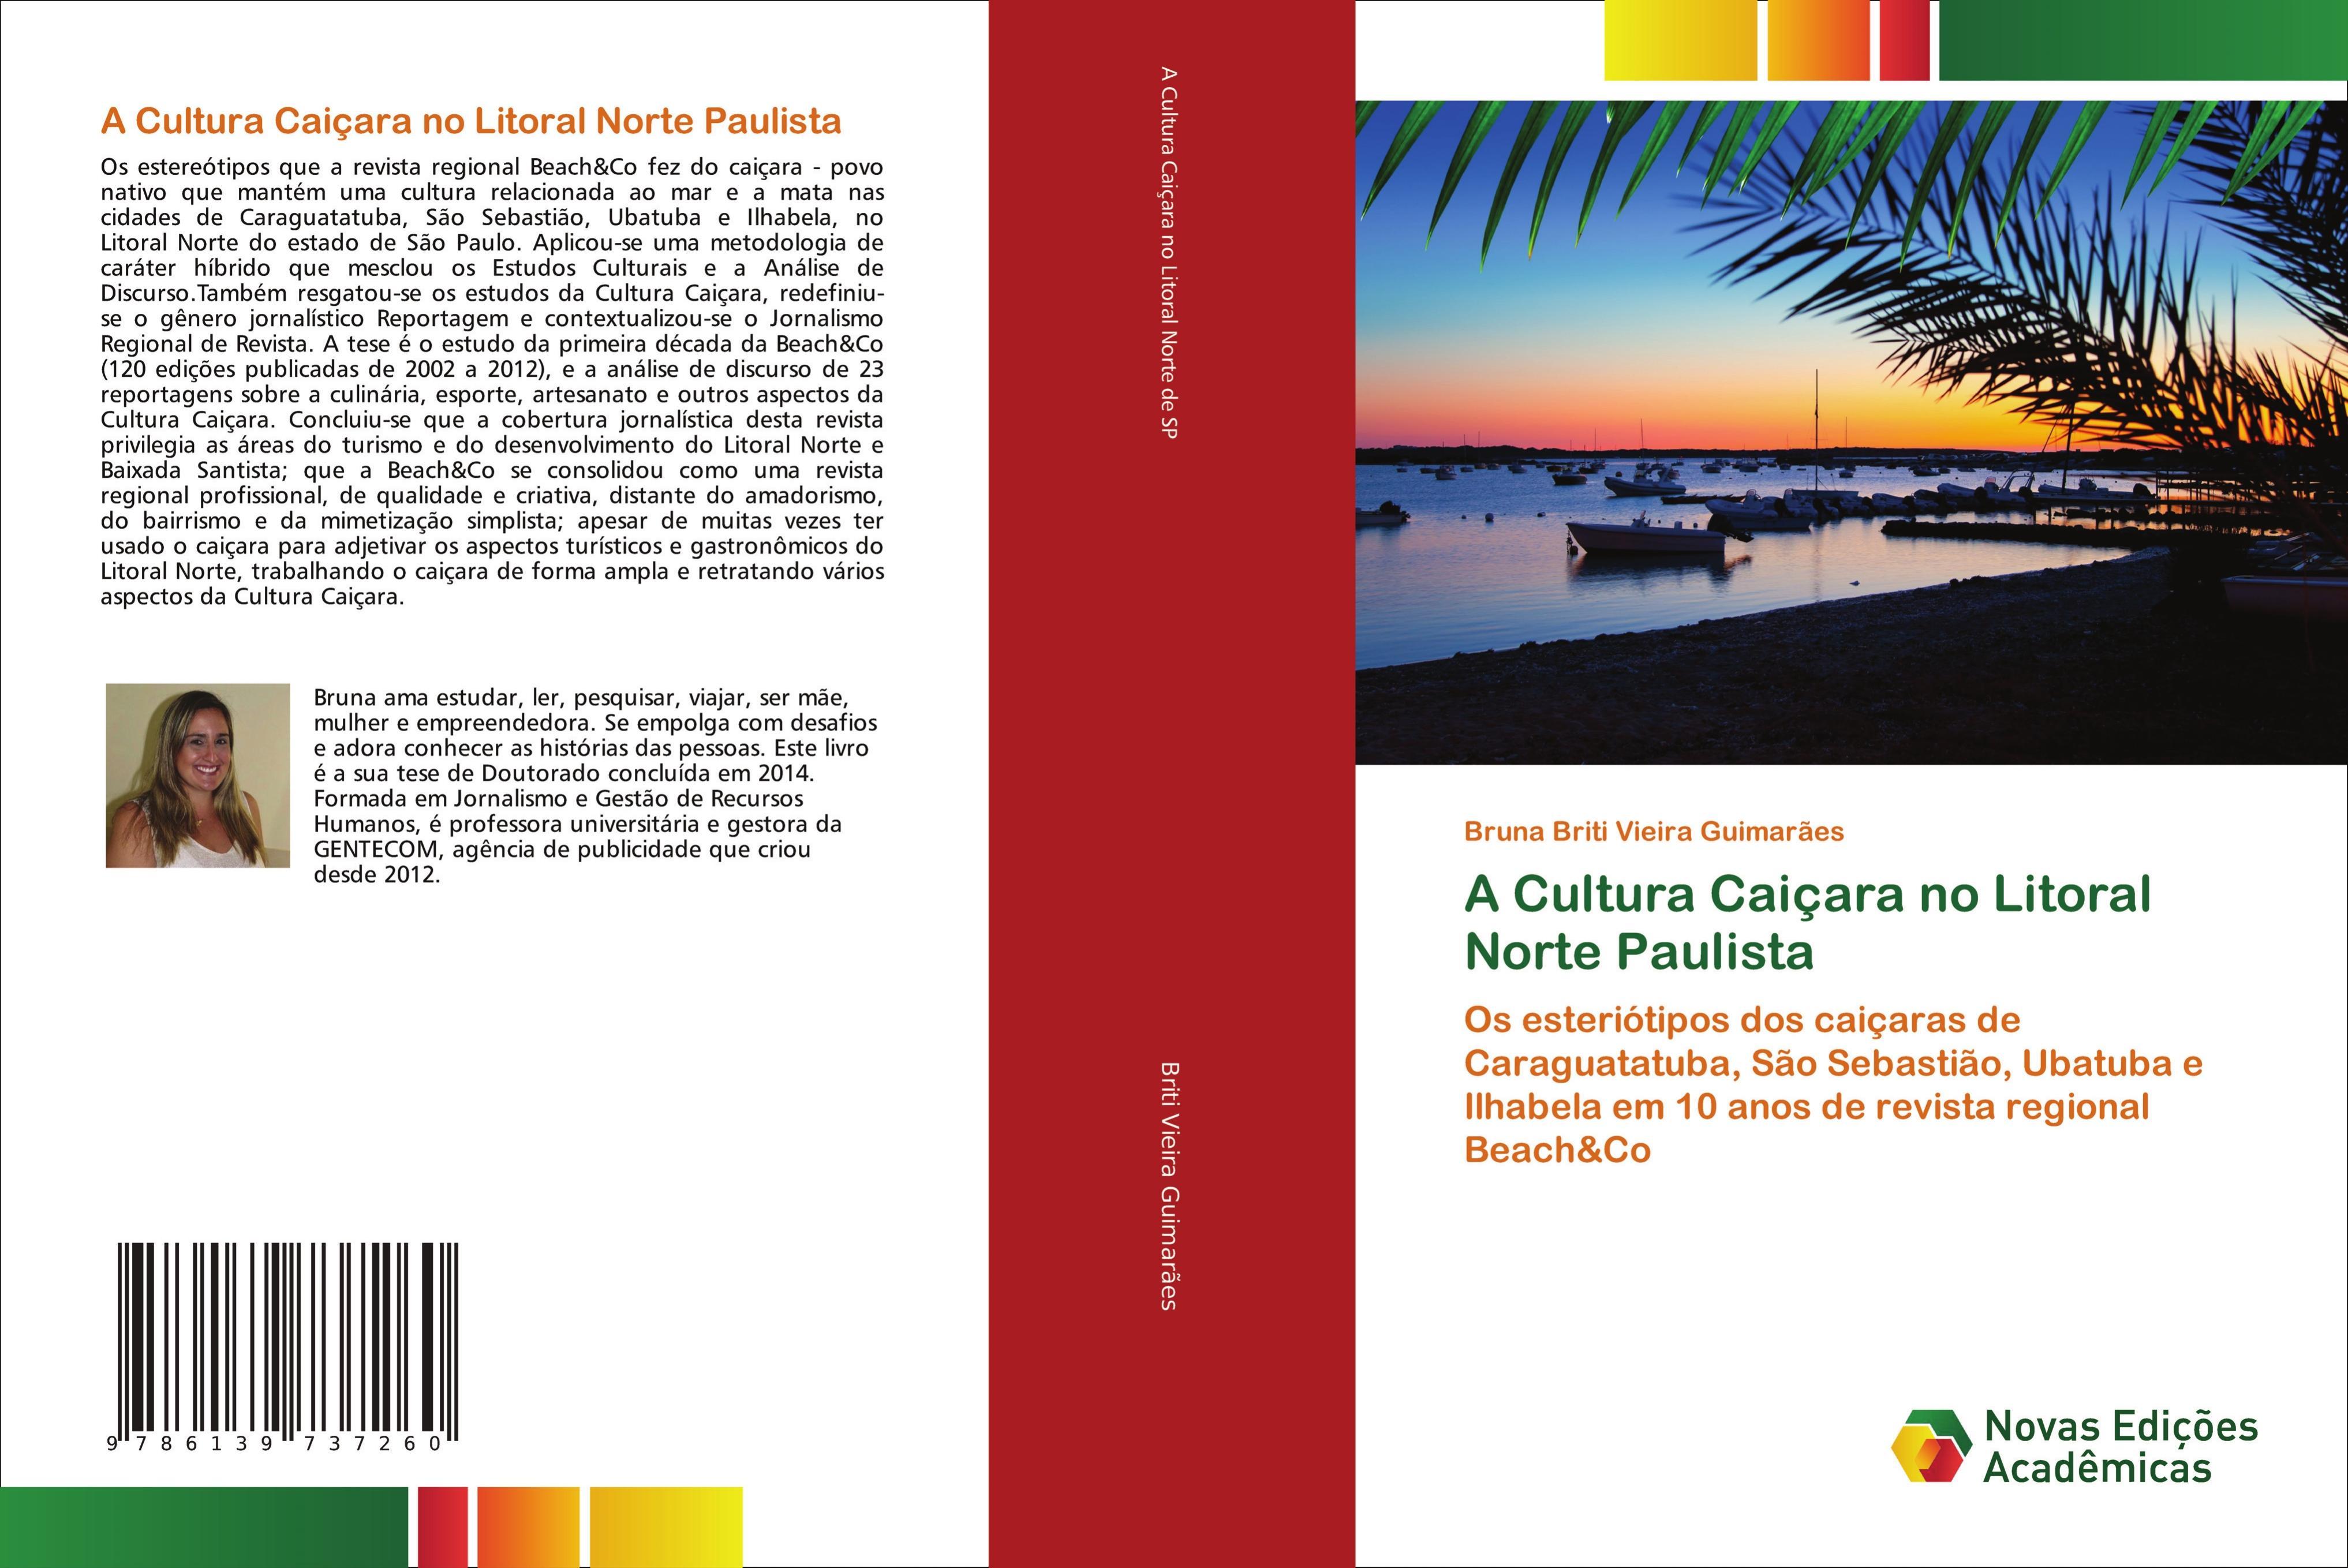 A Cultura Caiçara no Litoral Norte Paulista  Bruna Briti Vieira Guimarães  Taschenbuch  Portugiesisch  2019 - Briti Vieira Guimarães, Bruna